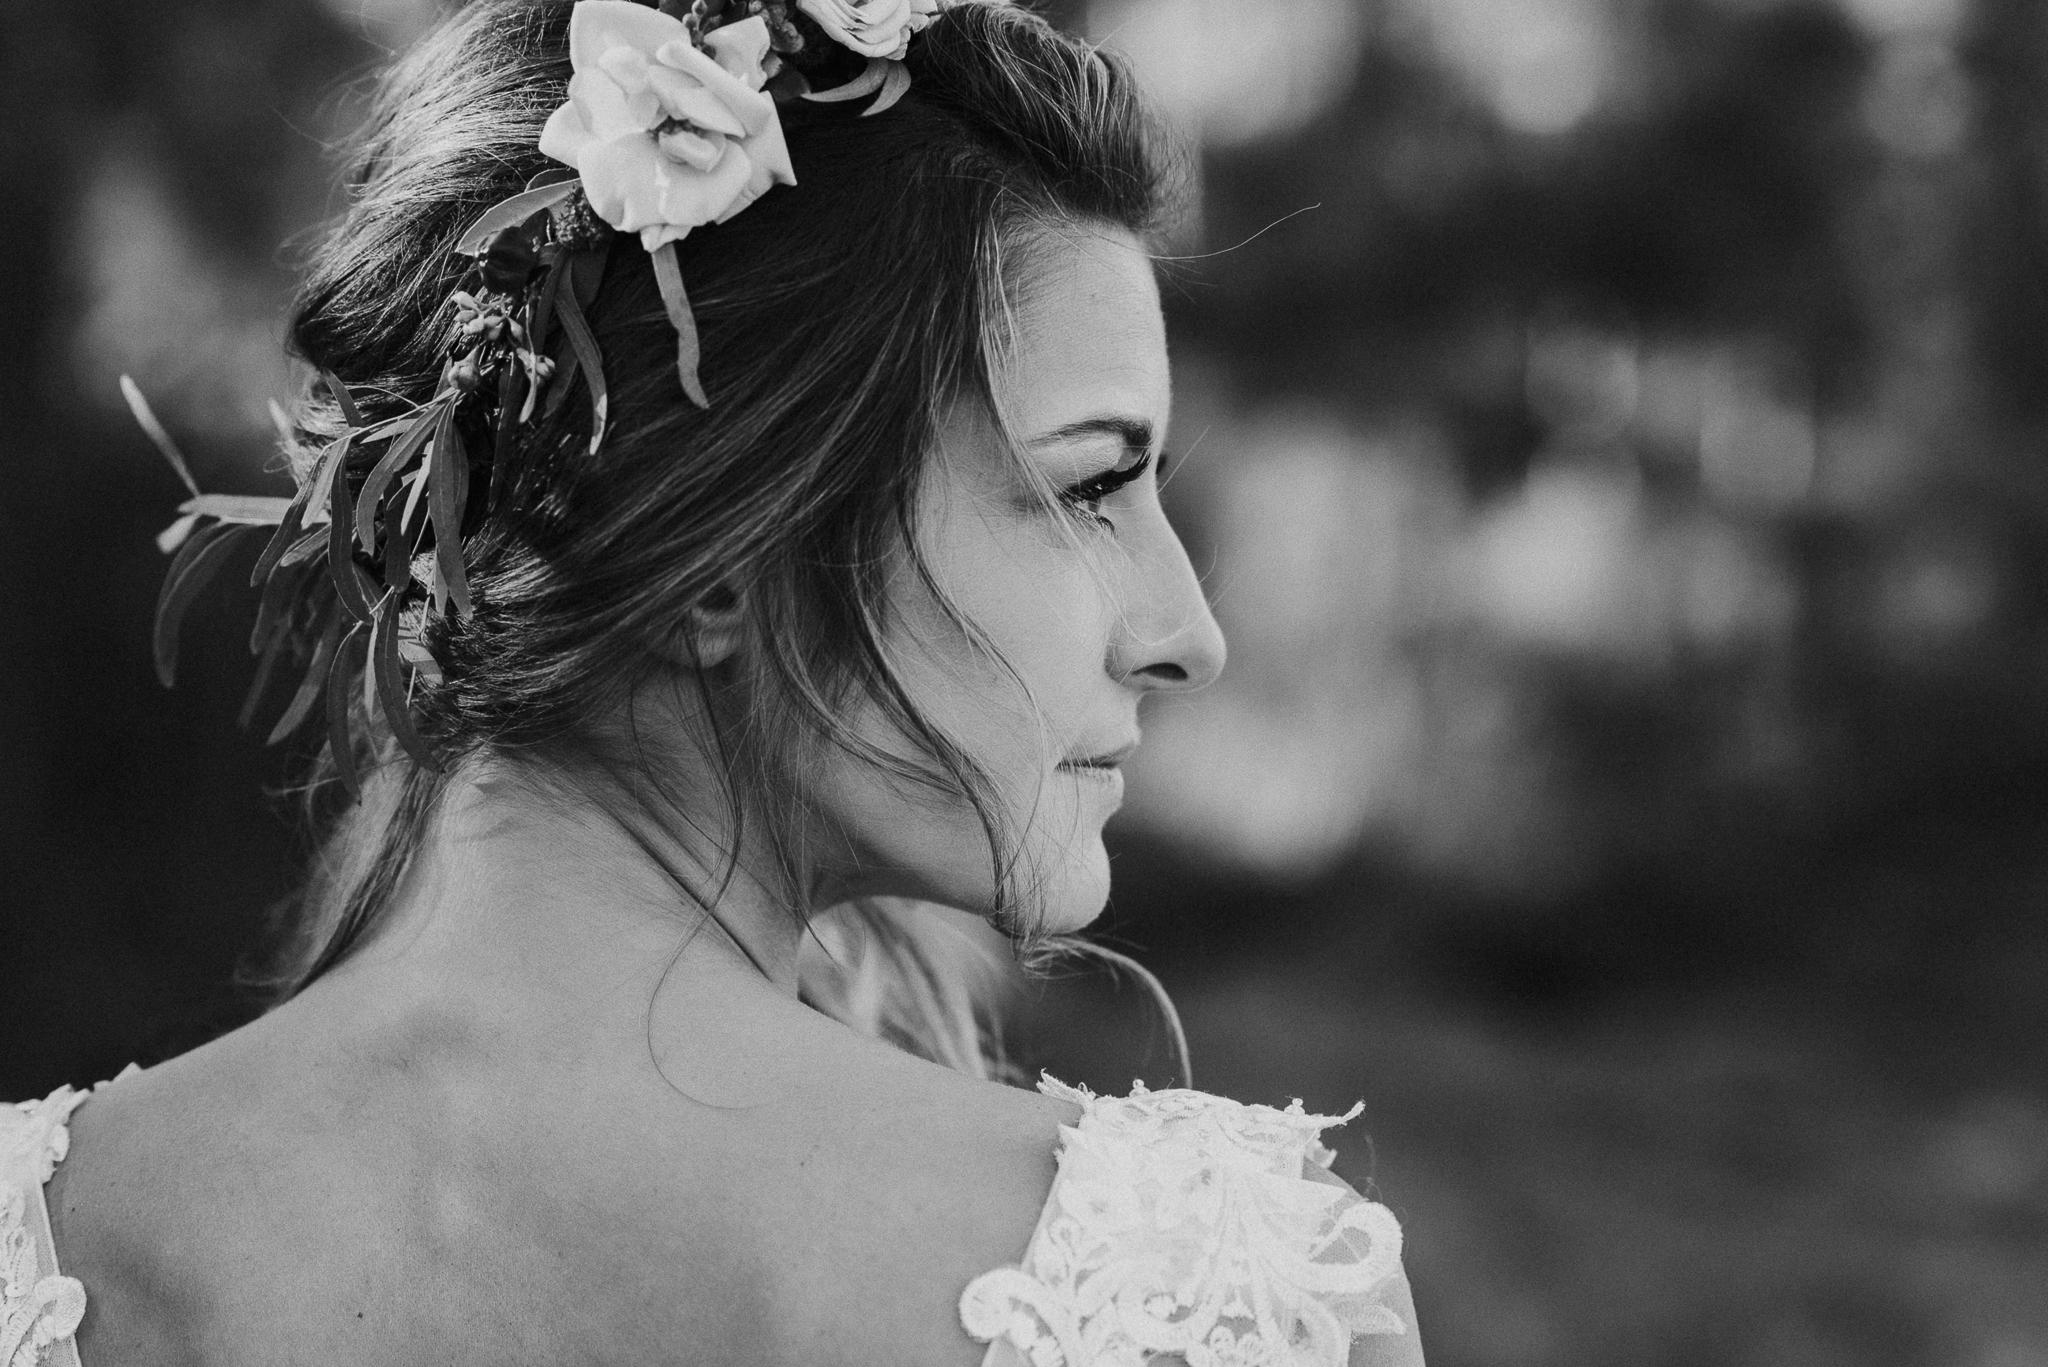 Michelle + Aron-Houston Wedding Photographer-Magnolia Meadows-Winter Wedding | Kristen Giles Photography - 026.jpg